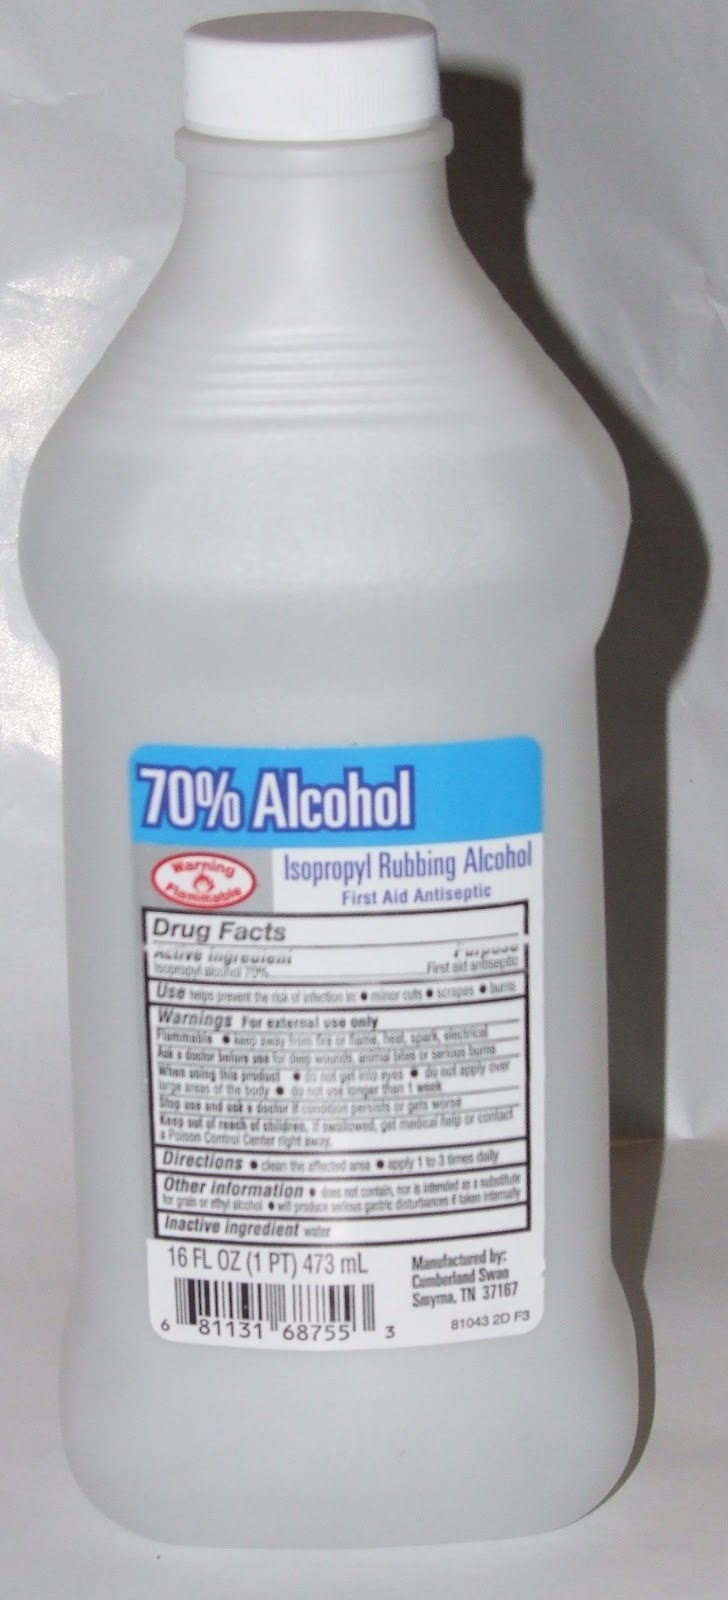 Ocdelightful Isopropyl Alcohol Rubbing Alcohol As A